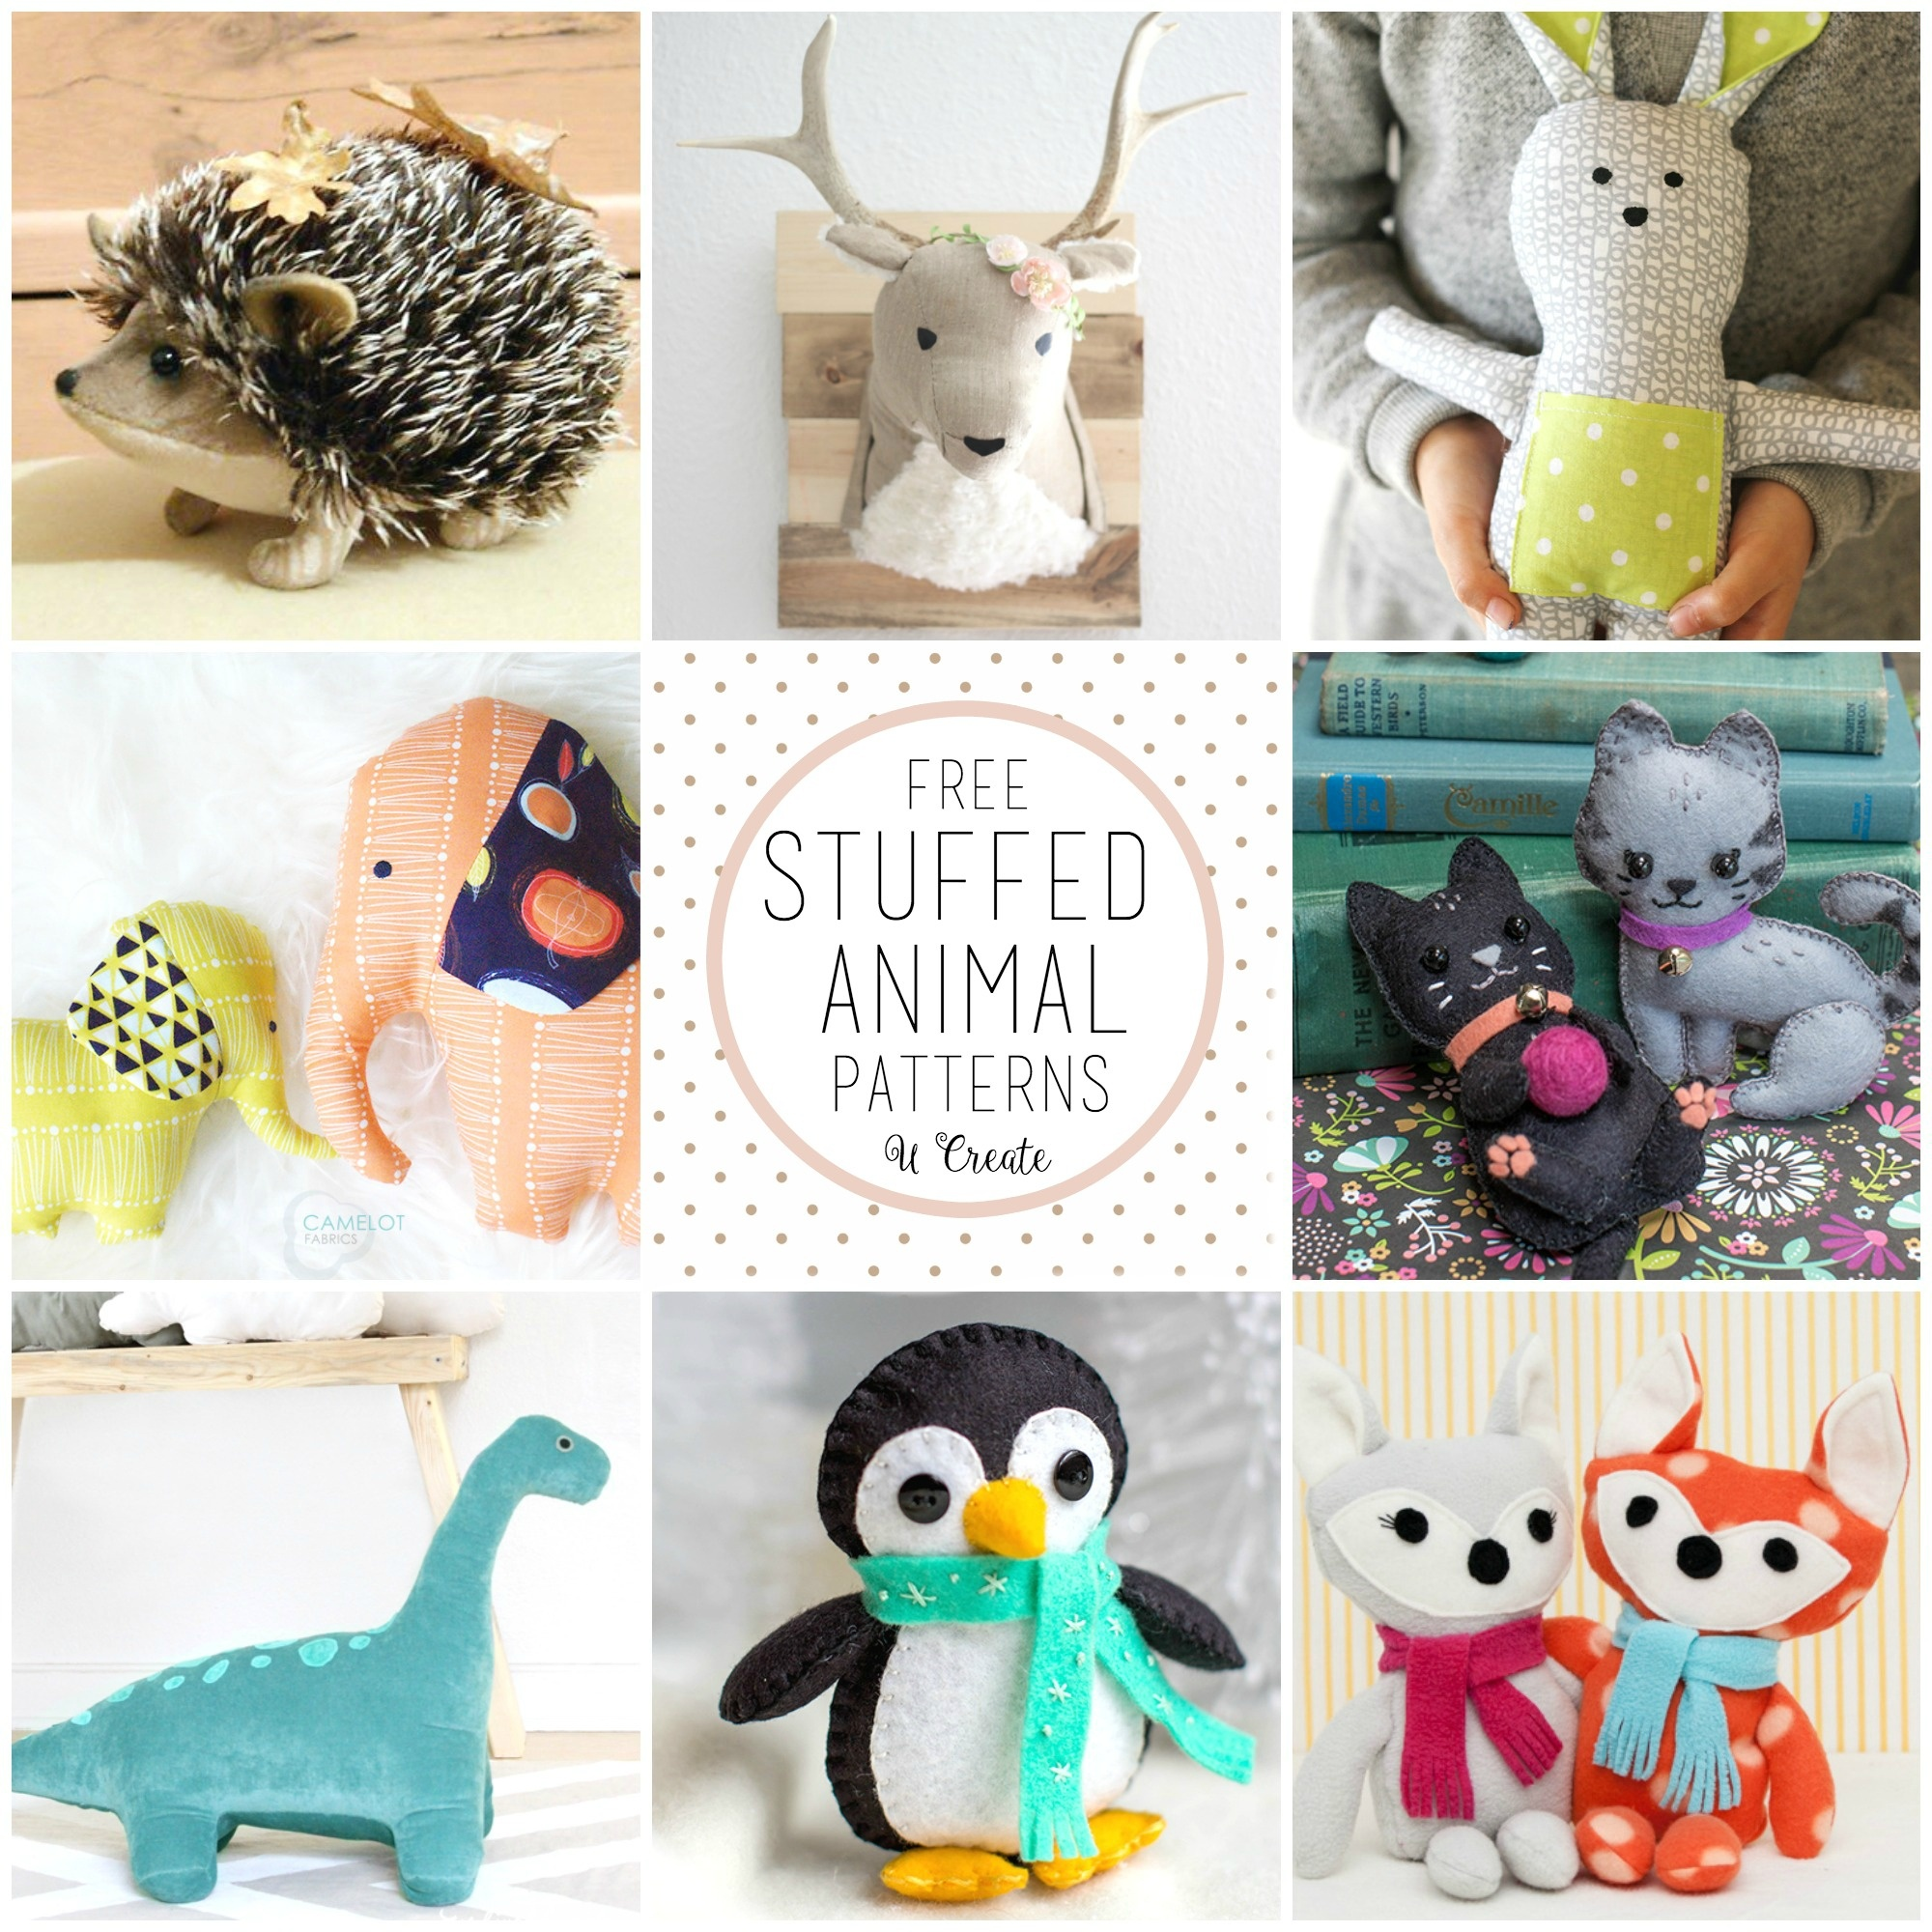 Free Stuffed Animal Patterns - The Cutest! - U Create - Free Printable Stuffed Animal Patterns